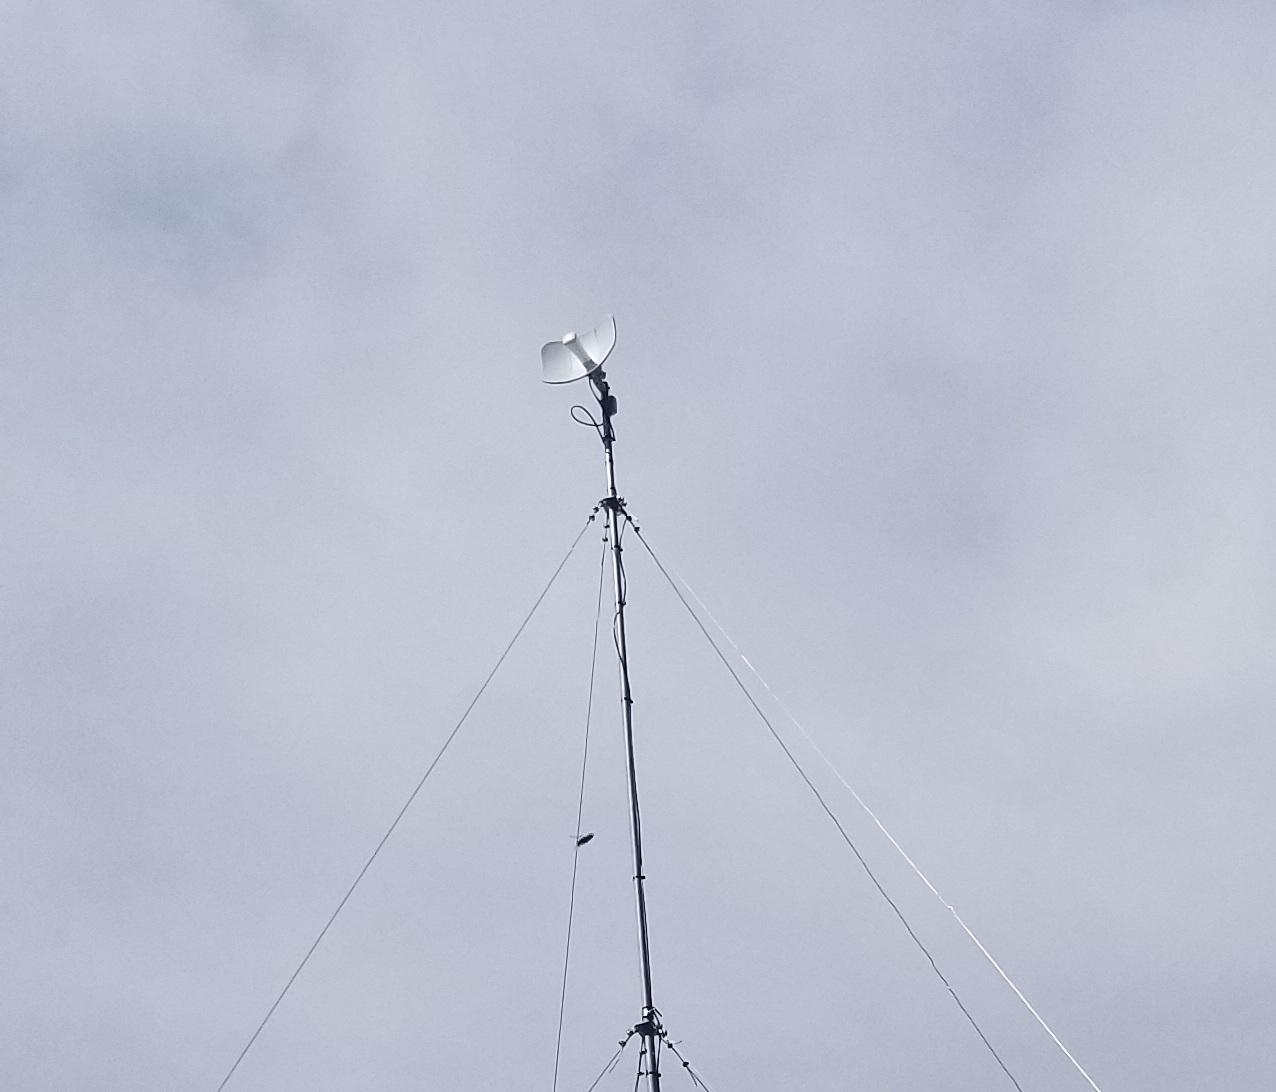 Long-Range-Wifi-12m-Tower